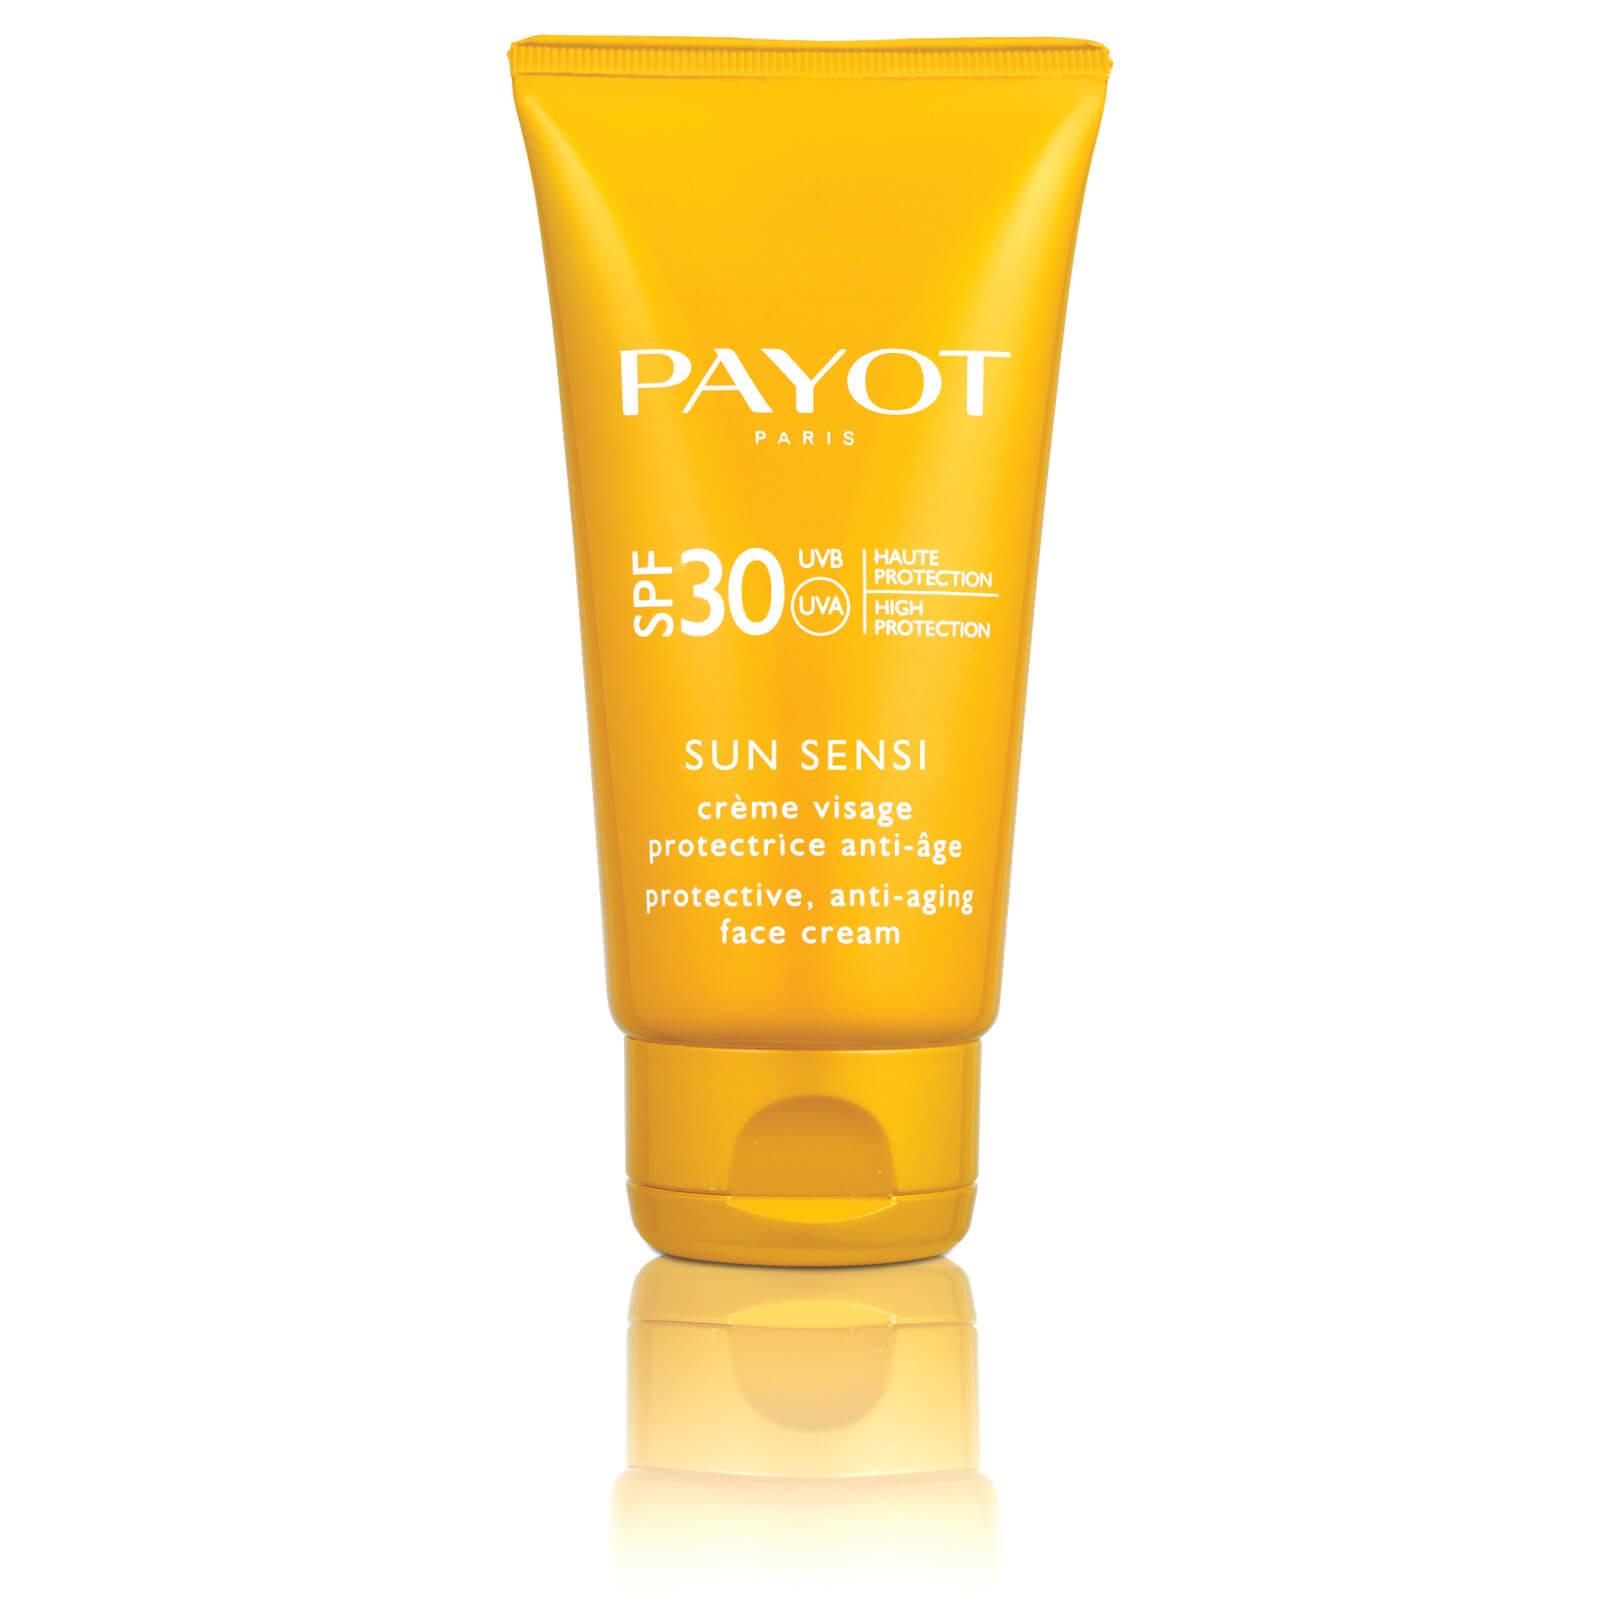 PAYOT Sun Sensi Protective Anti-Ageing Face Cream SPF 30 50ml